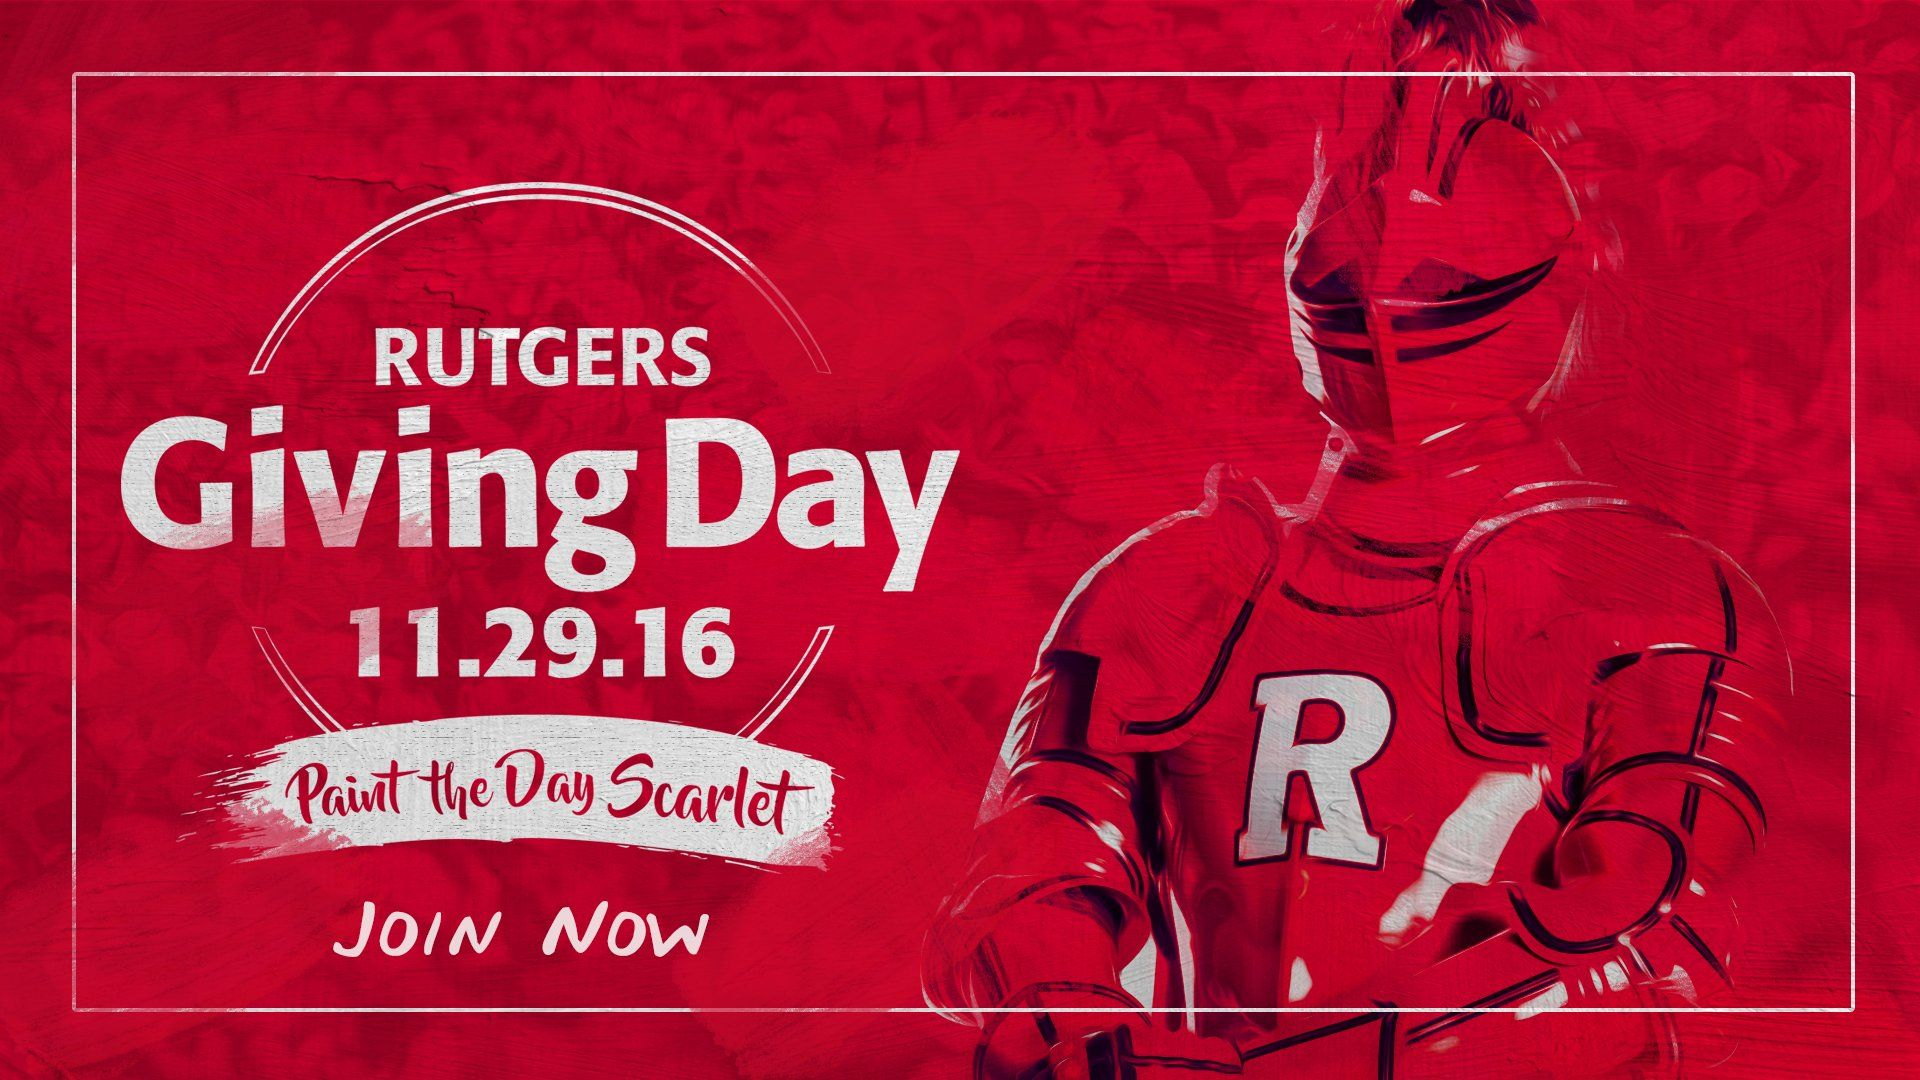 Rutgers Football Rfootball Twitter Rutgers Football Rutgers Football